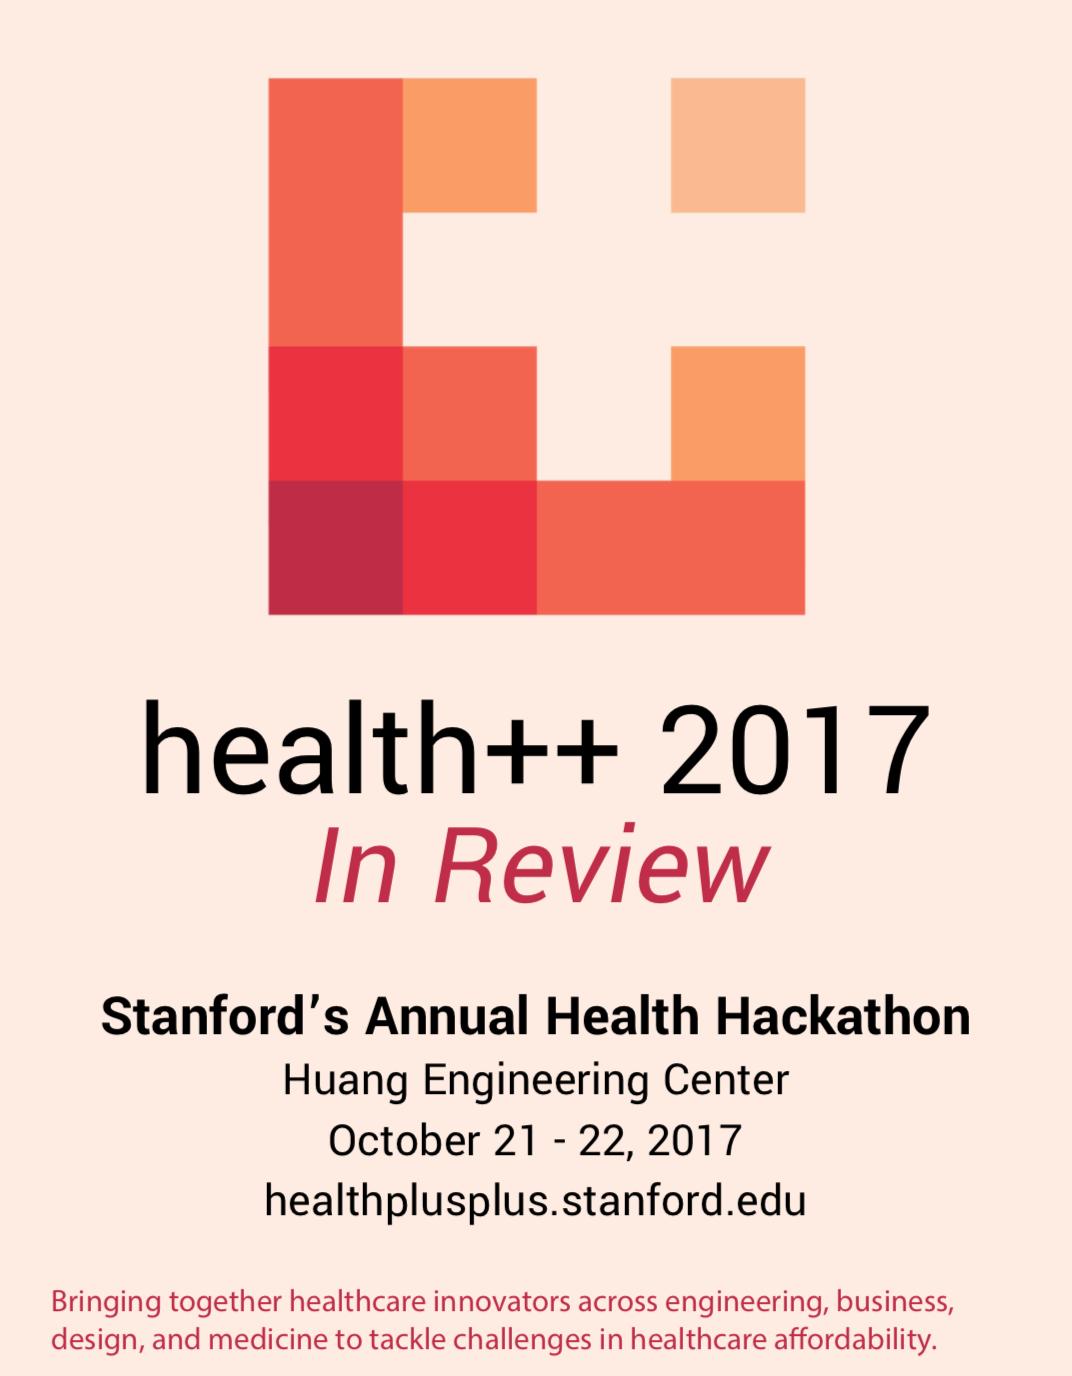 health++ 2017